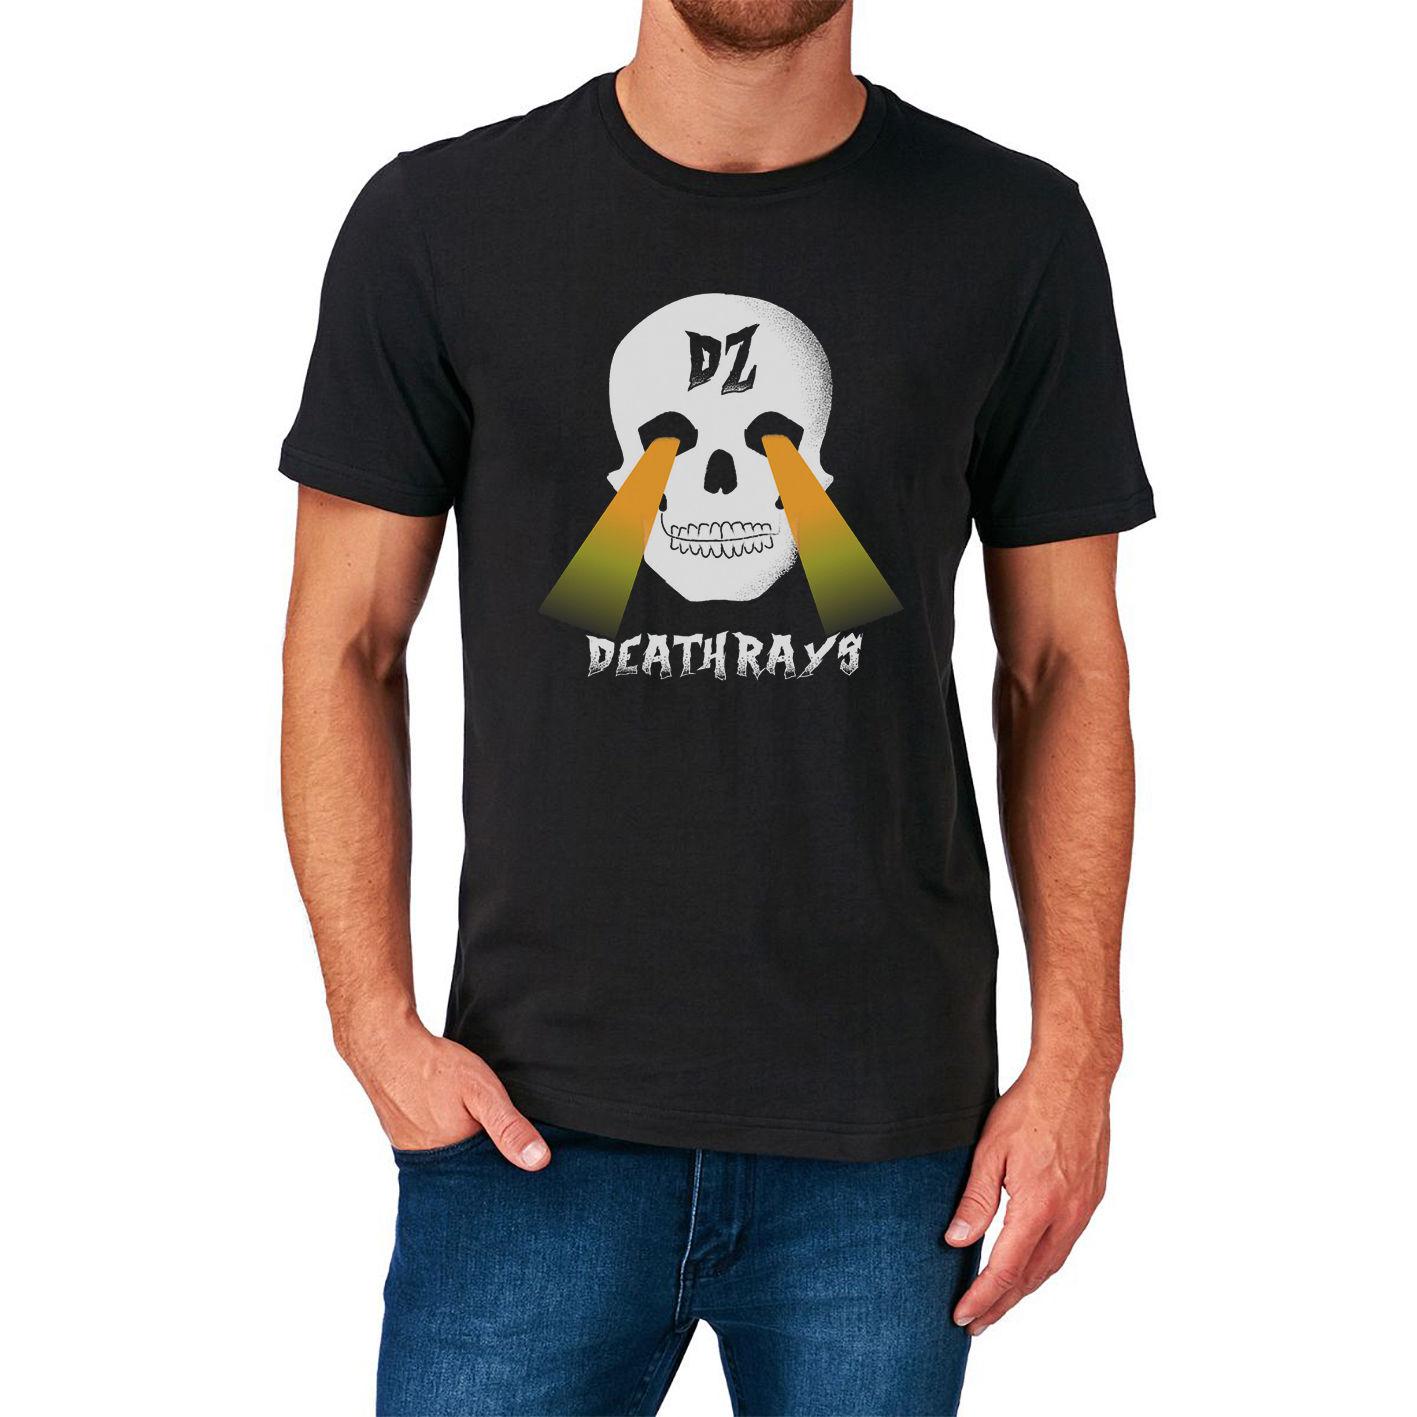 Design t shirt online australia - 2017 Gildan Fashion Dz Deathraysdance Punk Heavy Metal Hard Rock Music Australia Design T Shirt Tops